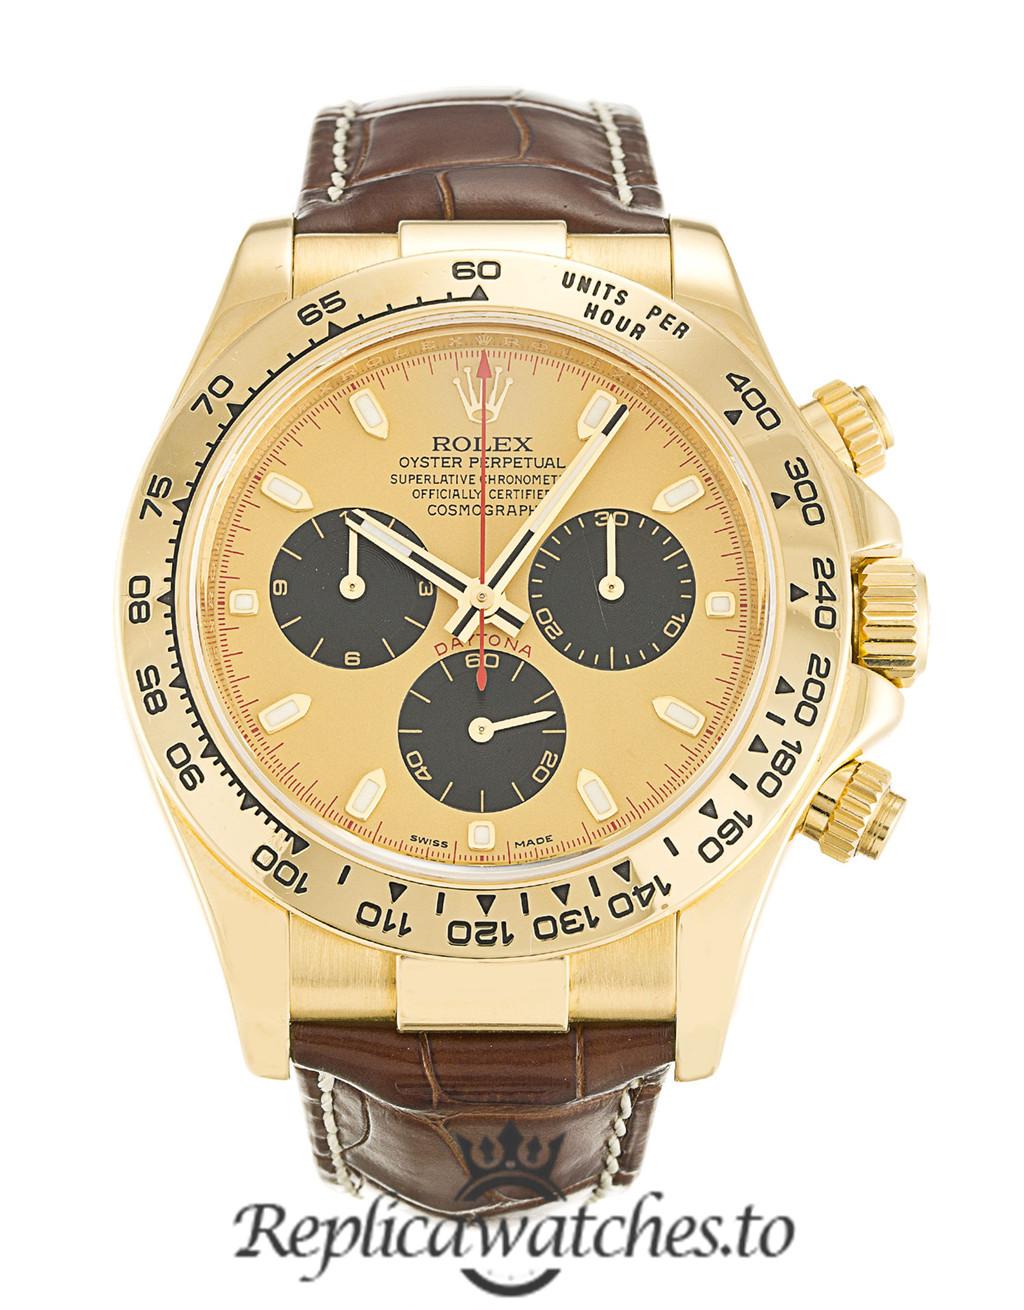 Rolex Daytona Replica 116518 003 Brown Strap 40MM